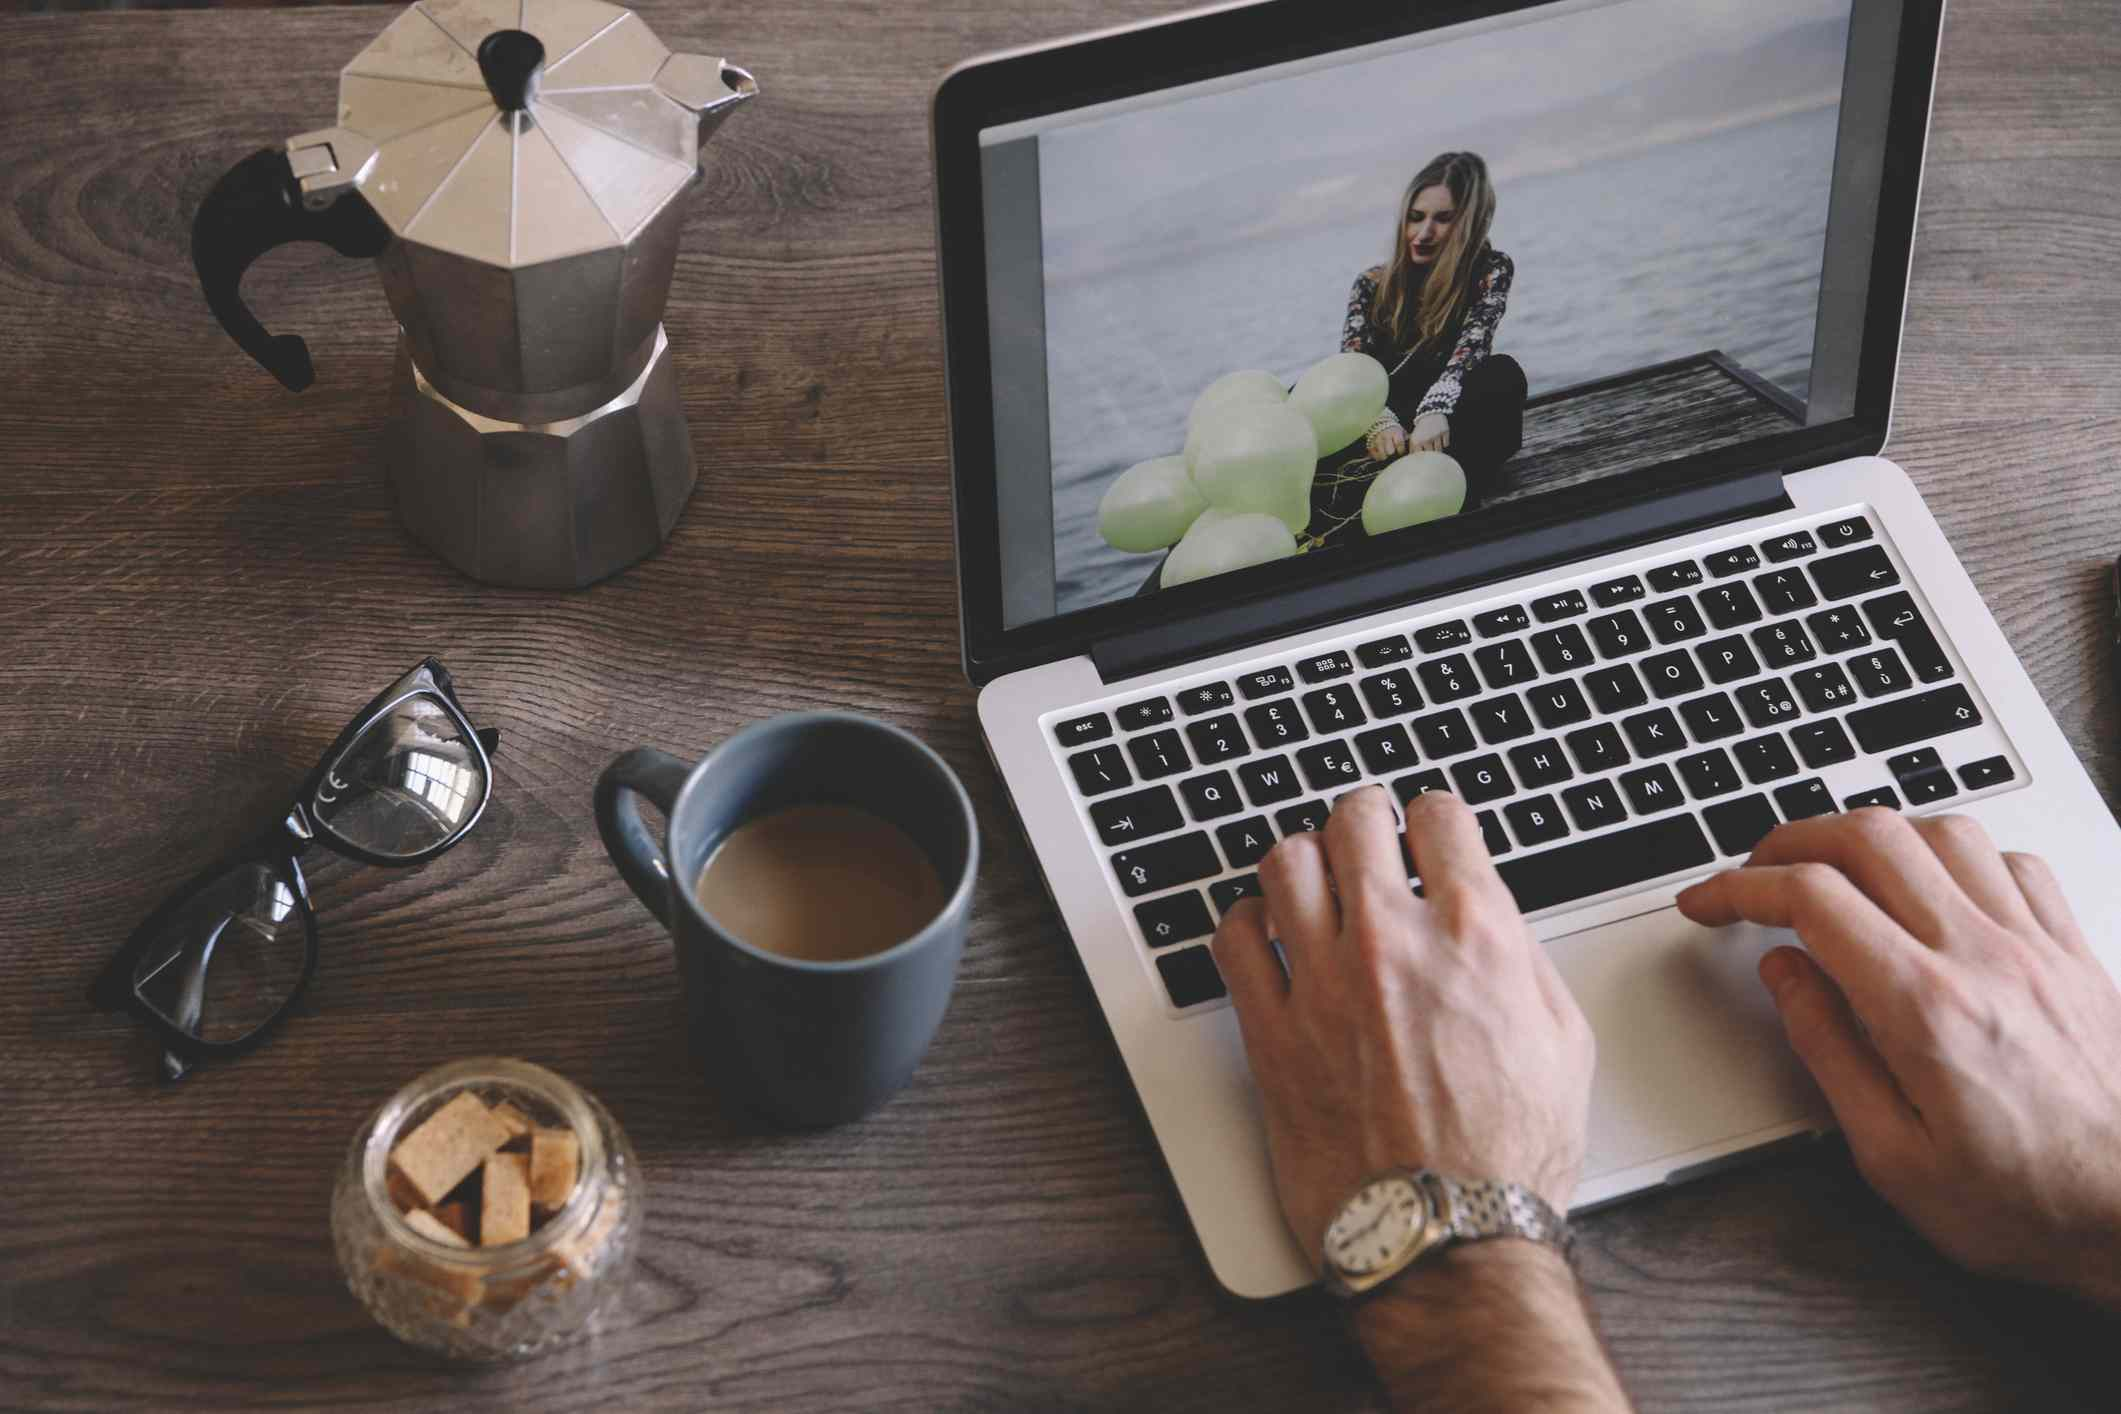 man using web graphics software on laptop